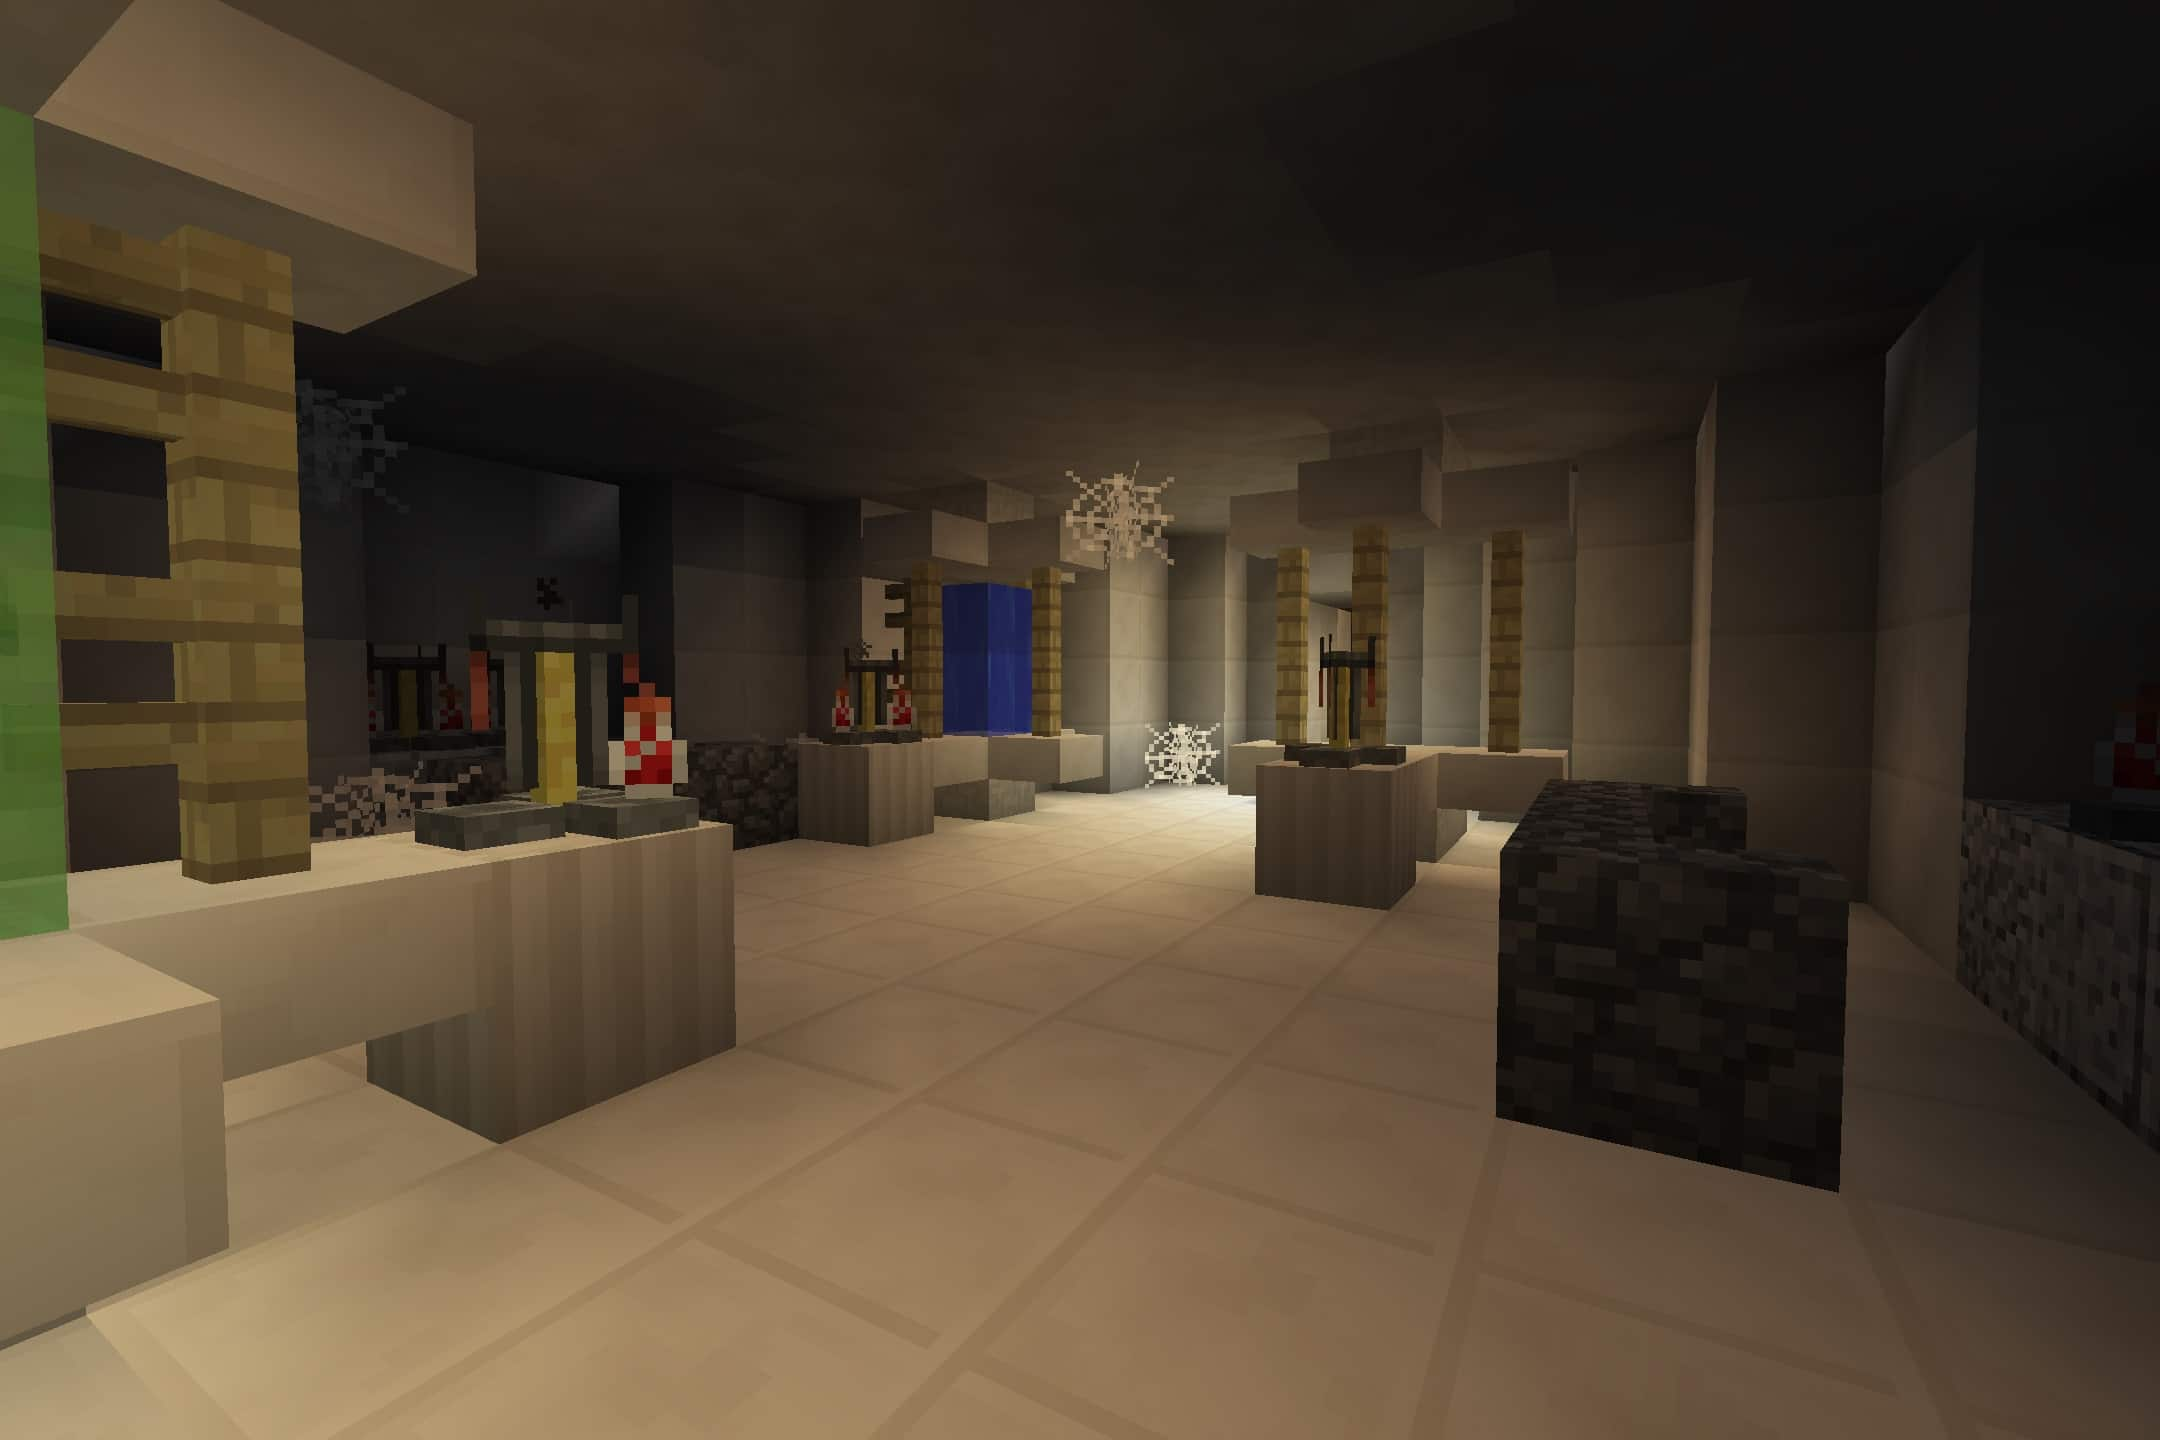 le laboratoire de Corpus